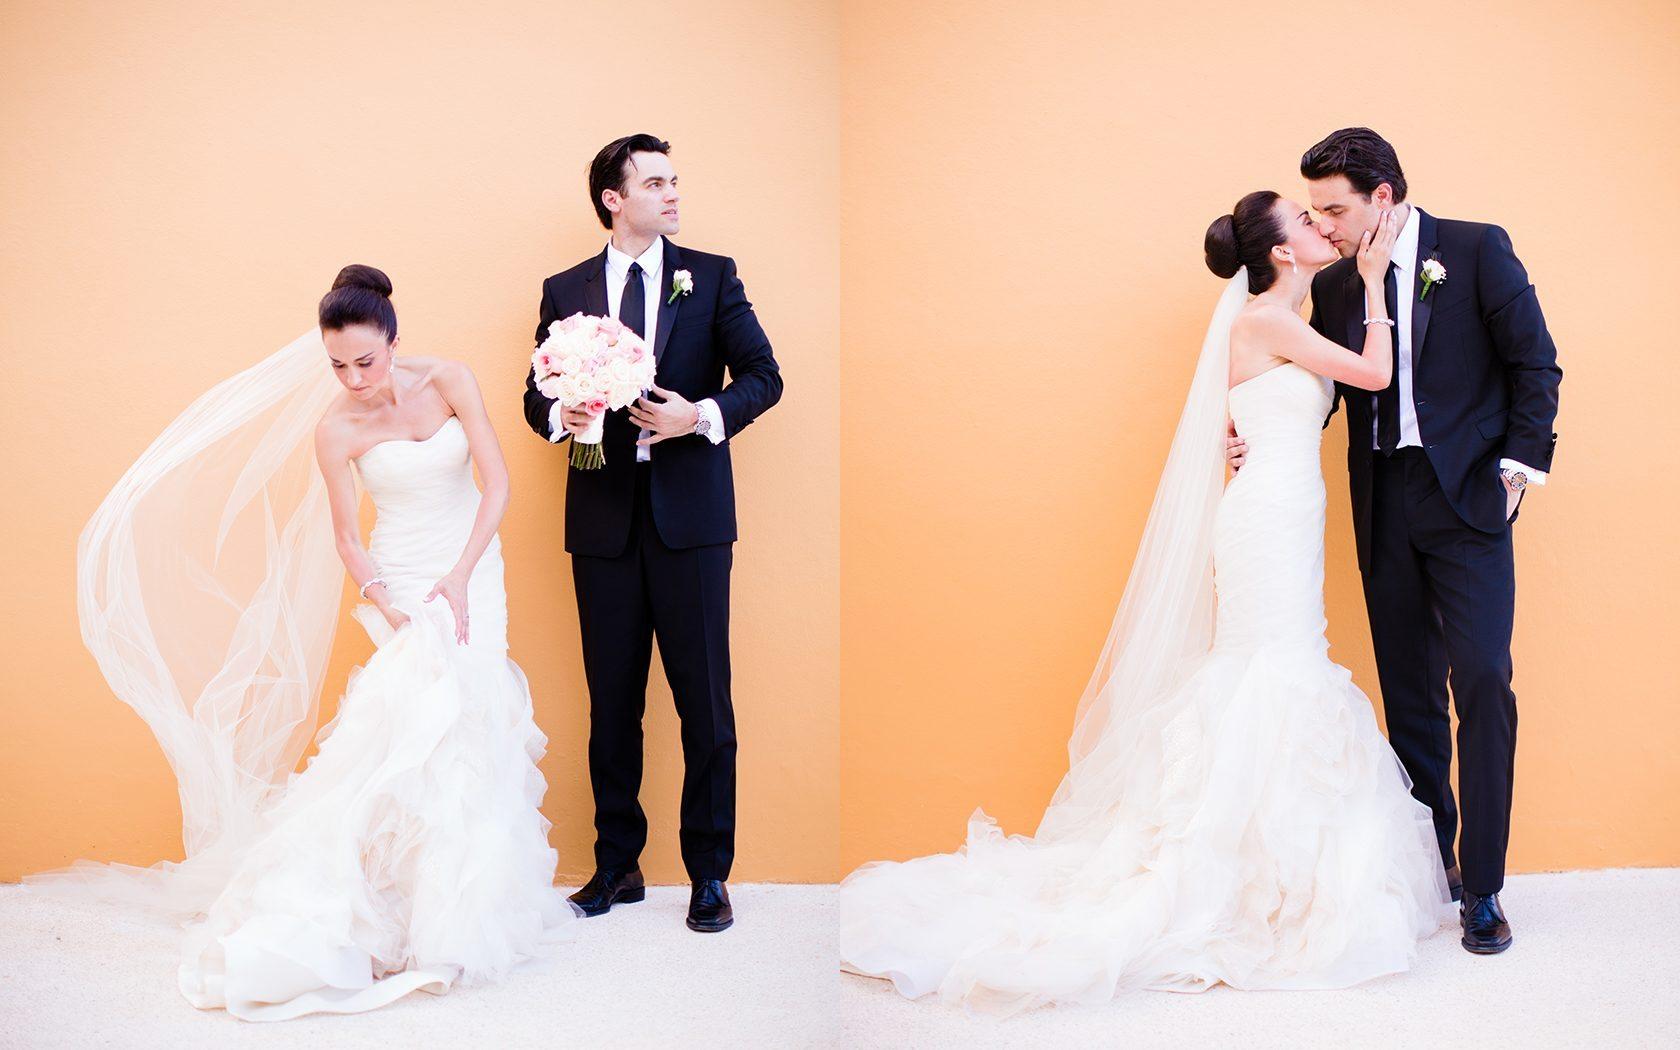 Fairmont_Mayakoba_Wedding_034-1680x1050.jpg